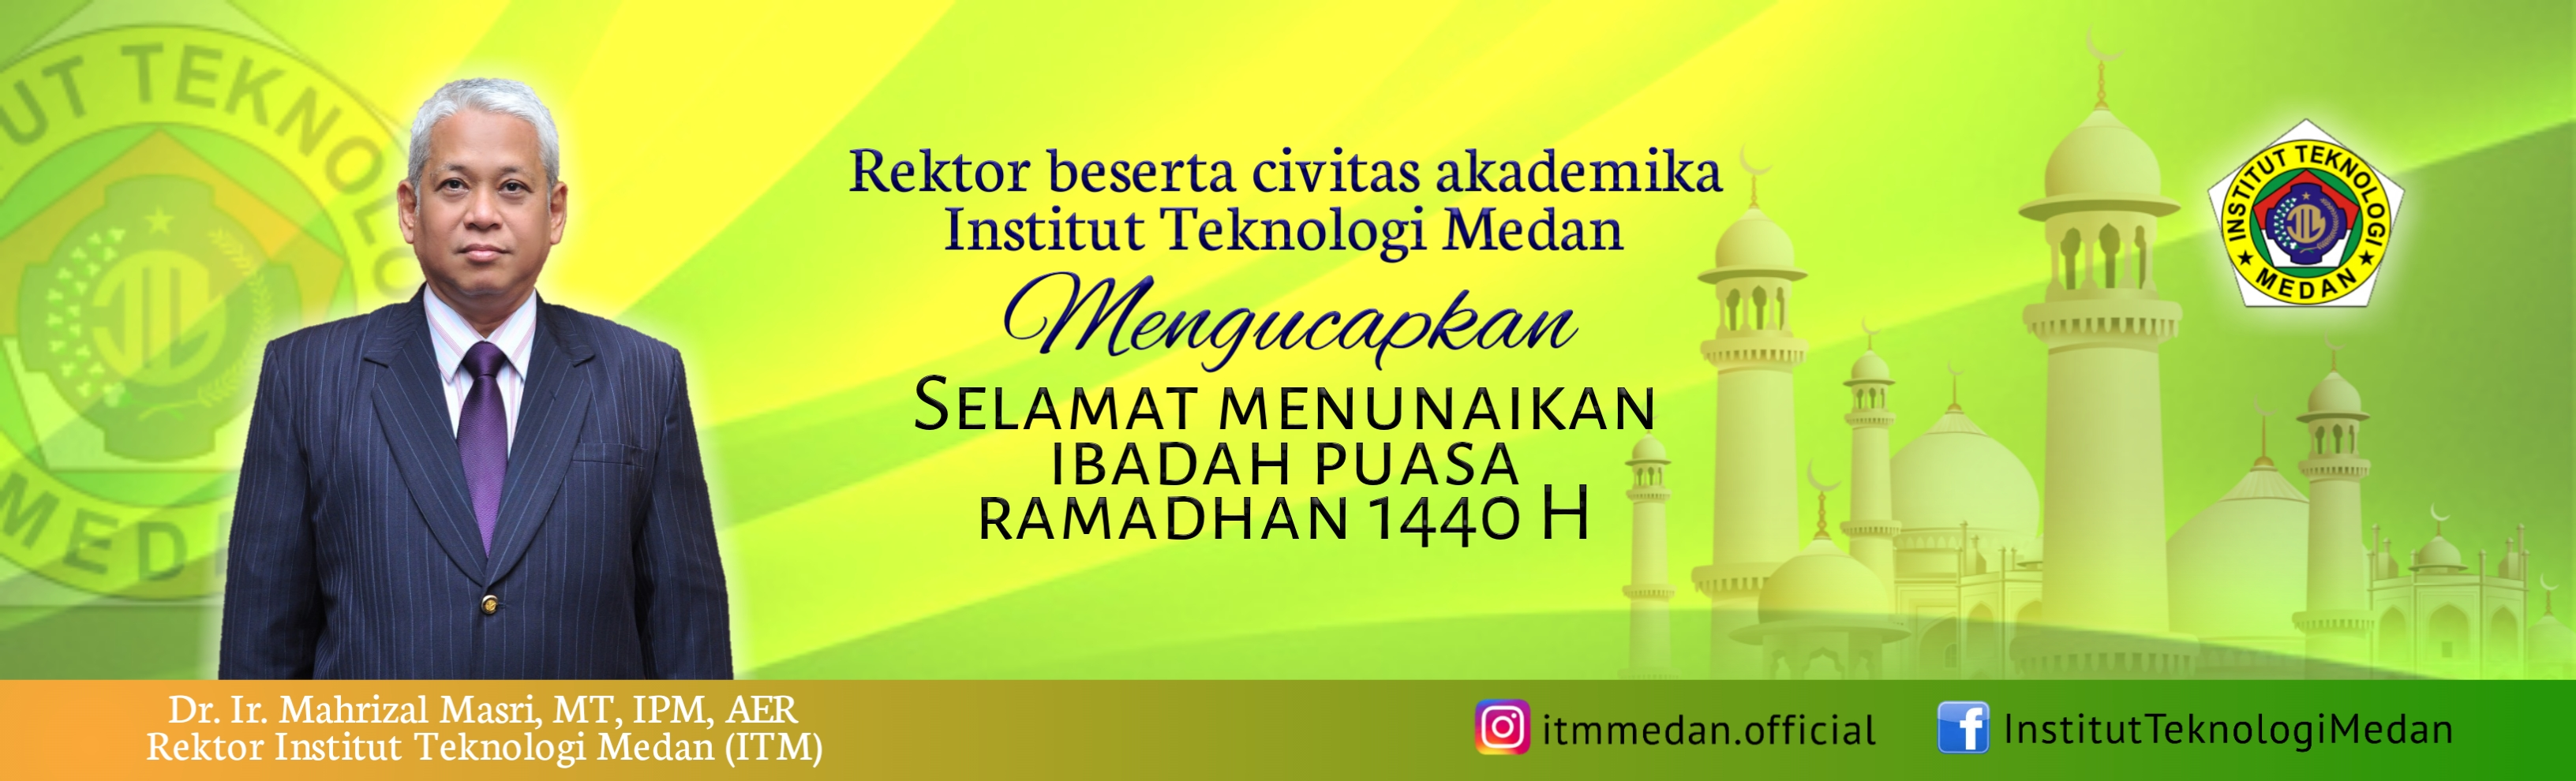 Ramadhan 1440 H